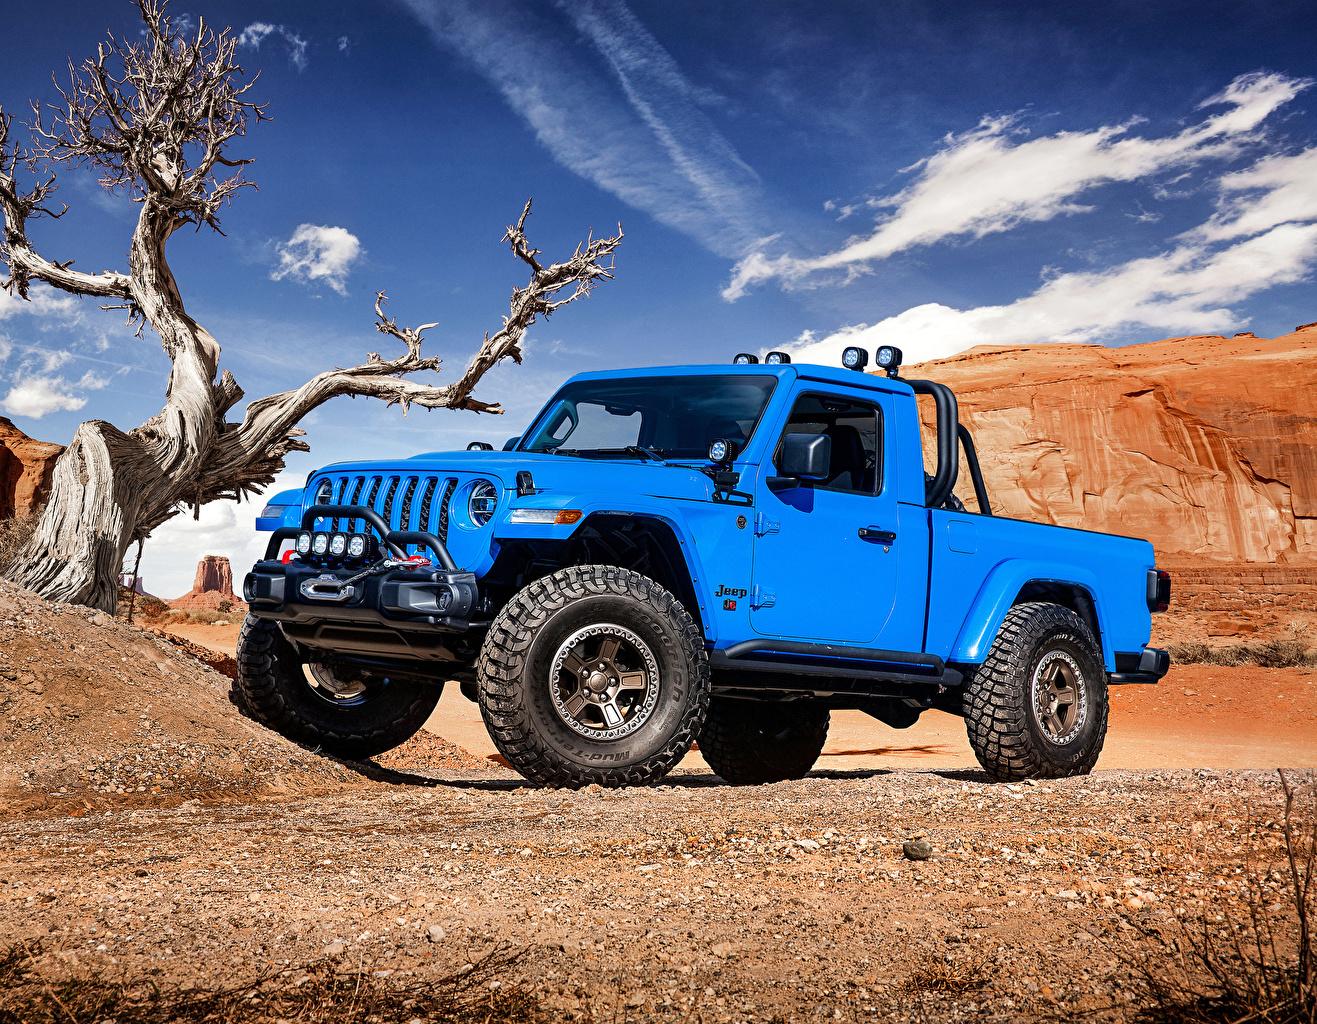 Картинки Джип 2019 J6 Пикап кузов Голубой Автомобили Jeep голубых голубые голубая авто машина машины автомобиль